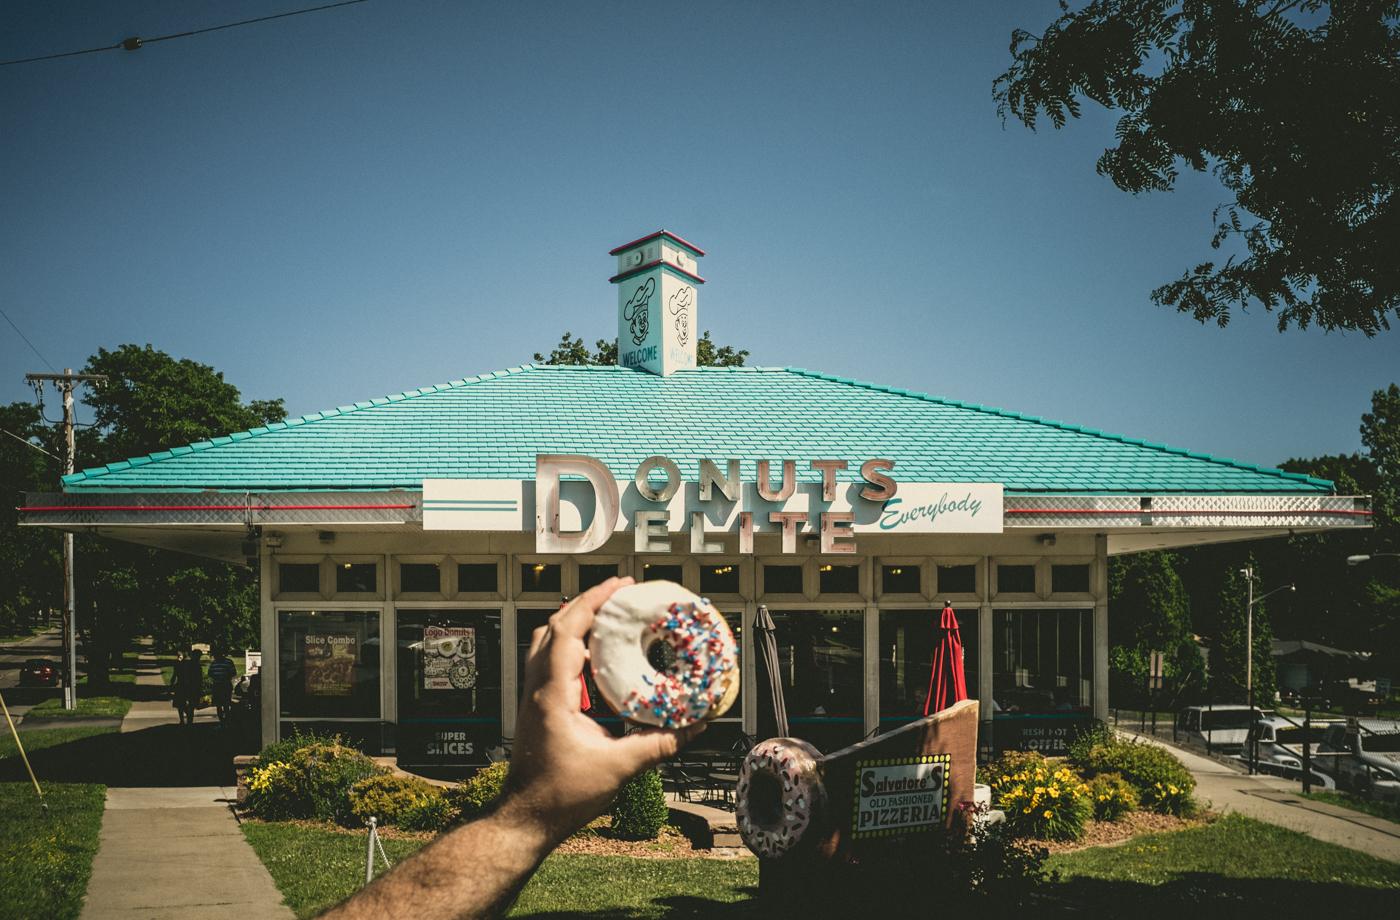 Donuts Delite Everybody